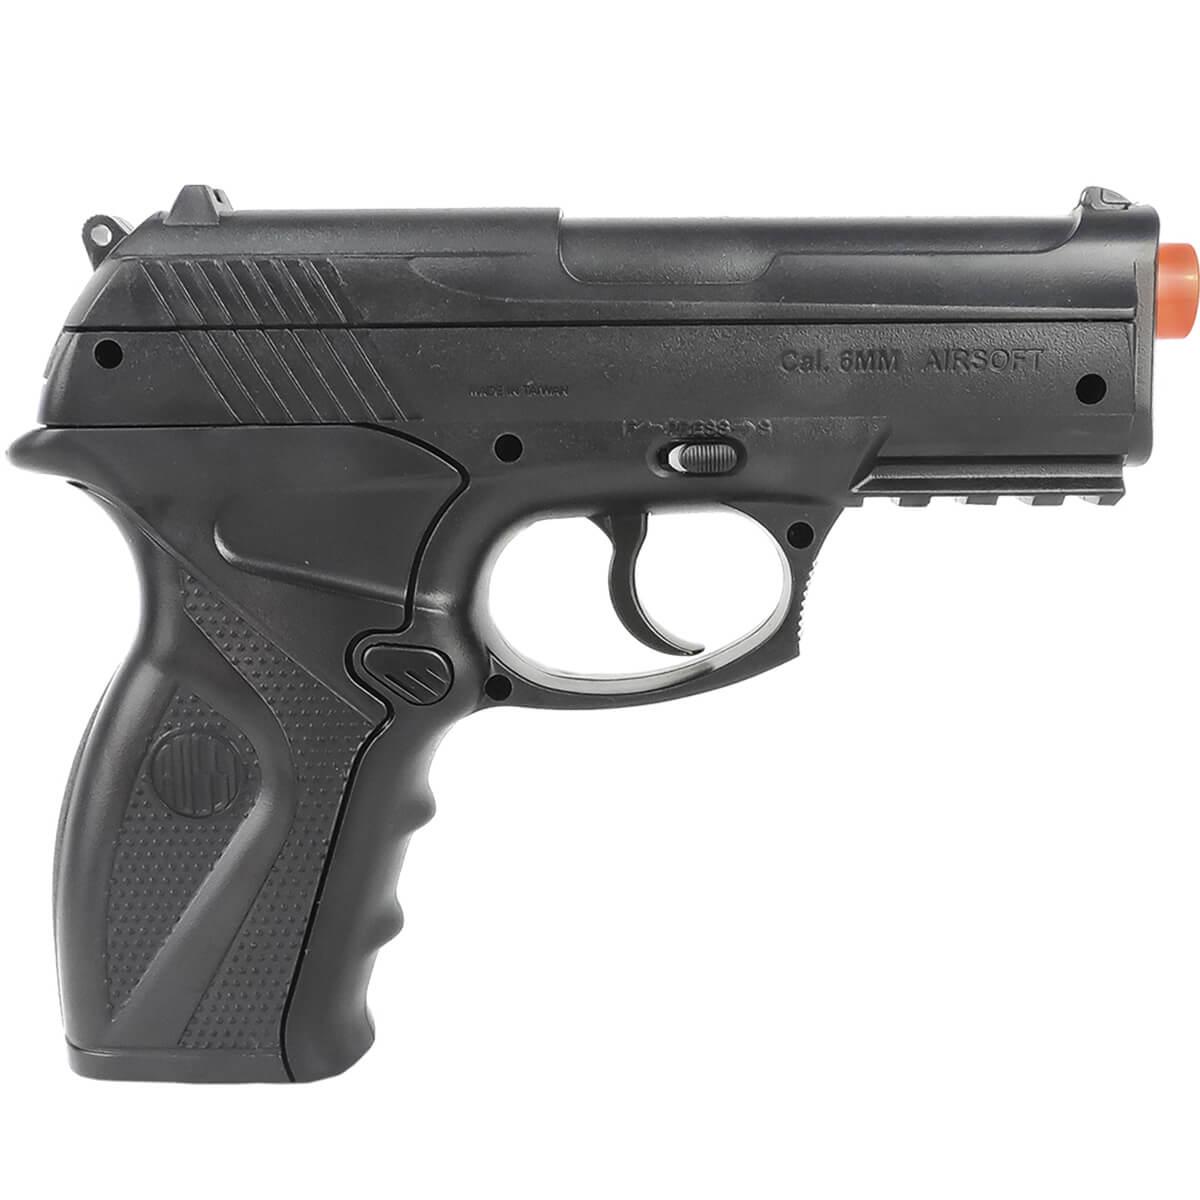 Pistola de Pressão CO2 C11 6mm Esfera de Aço